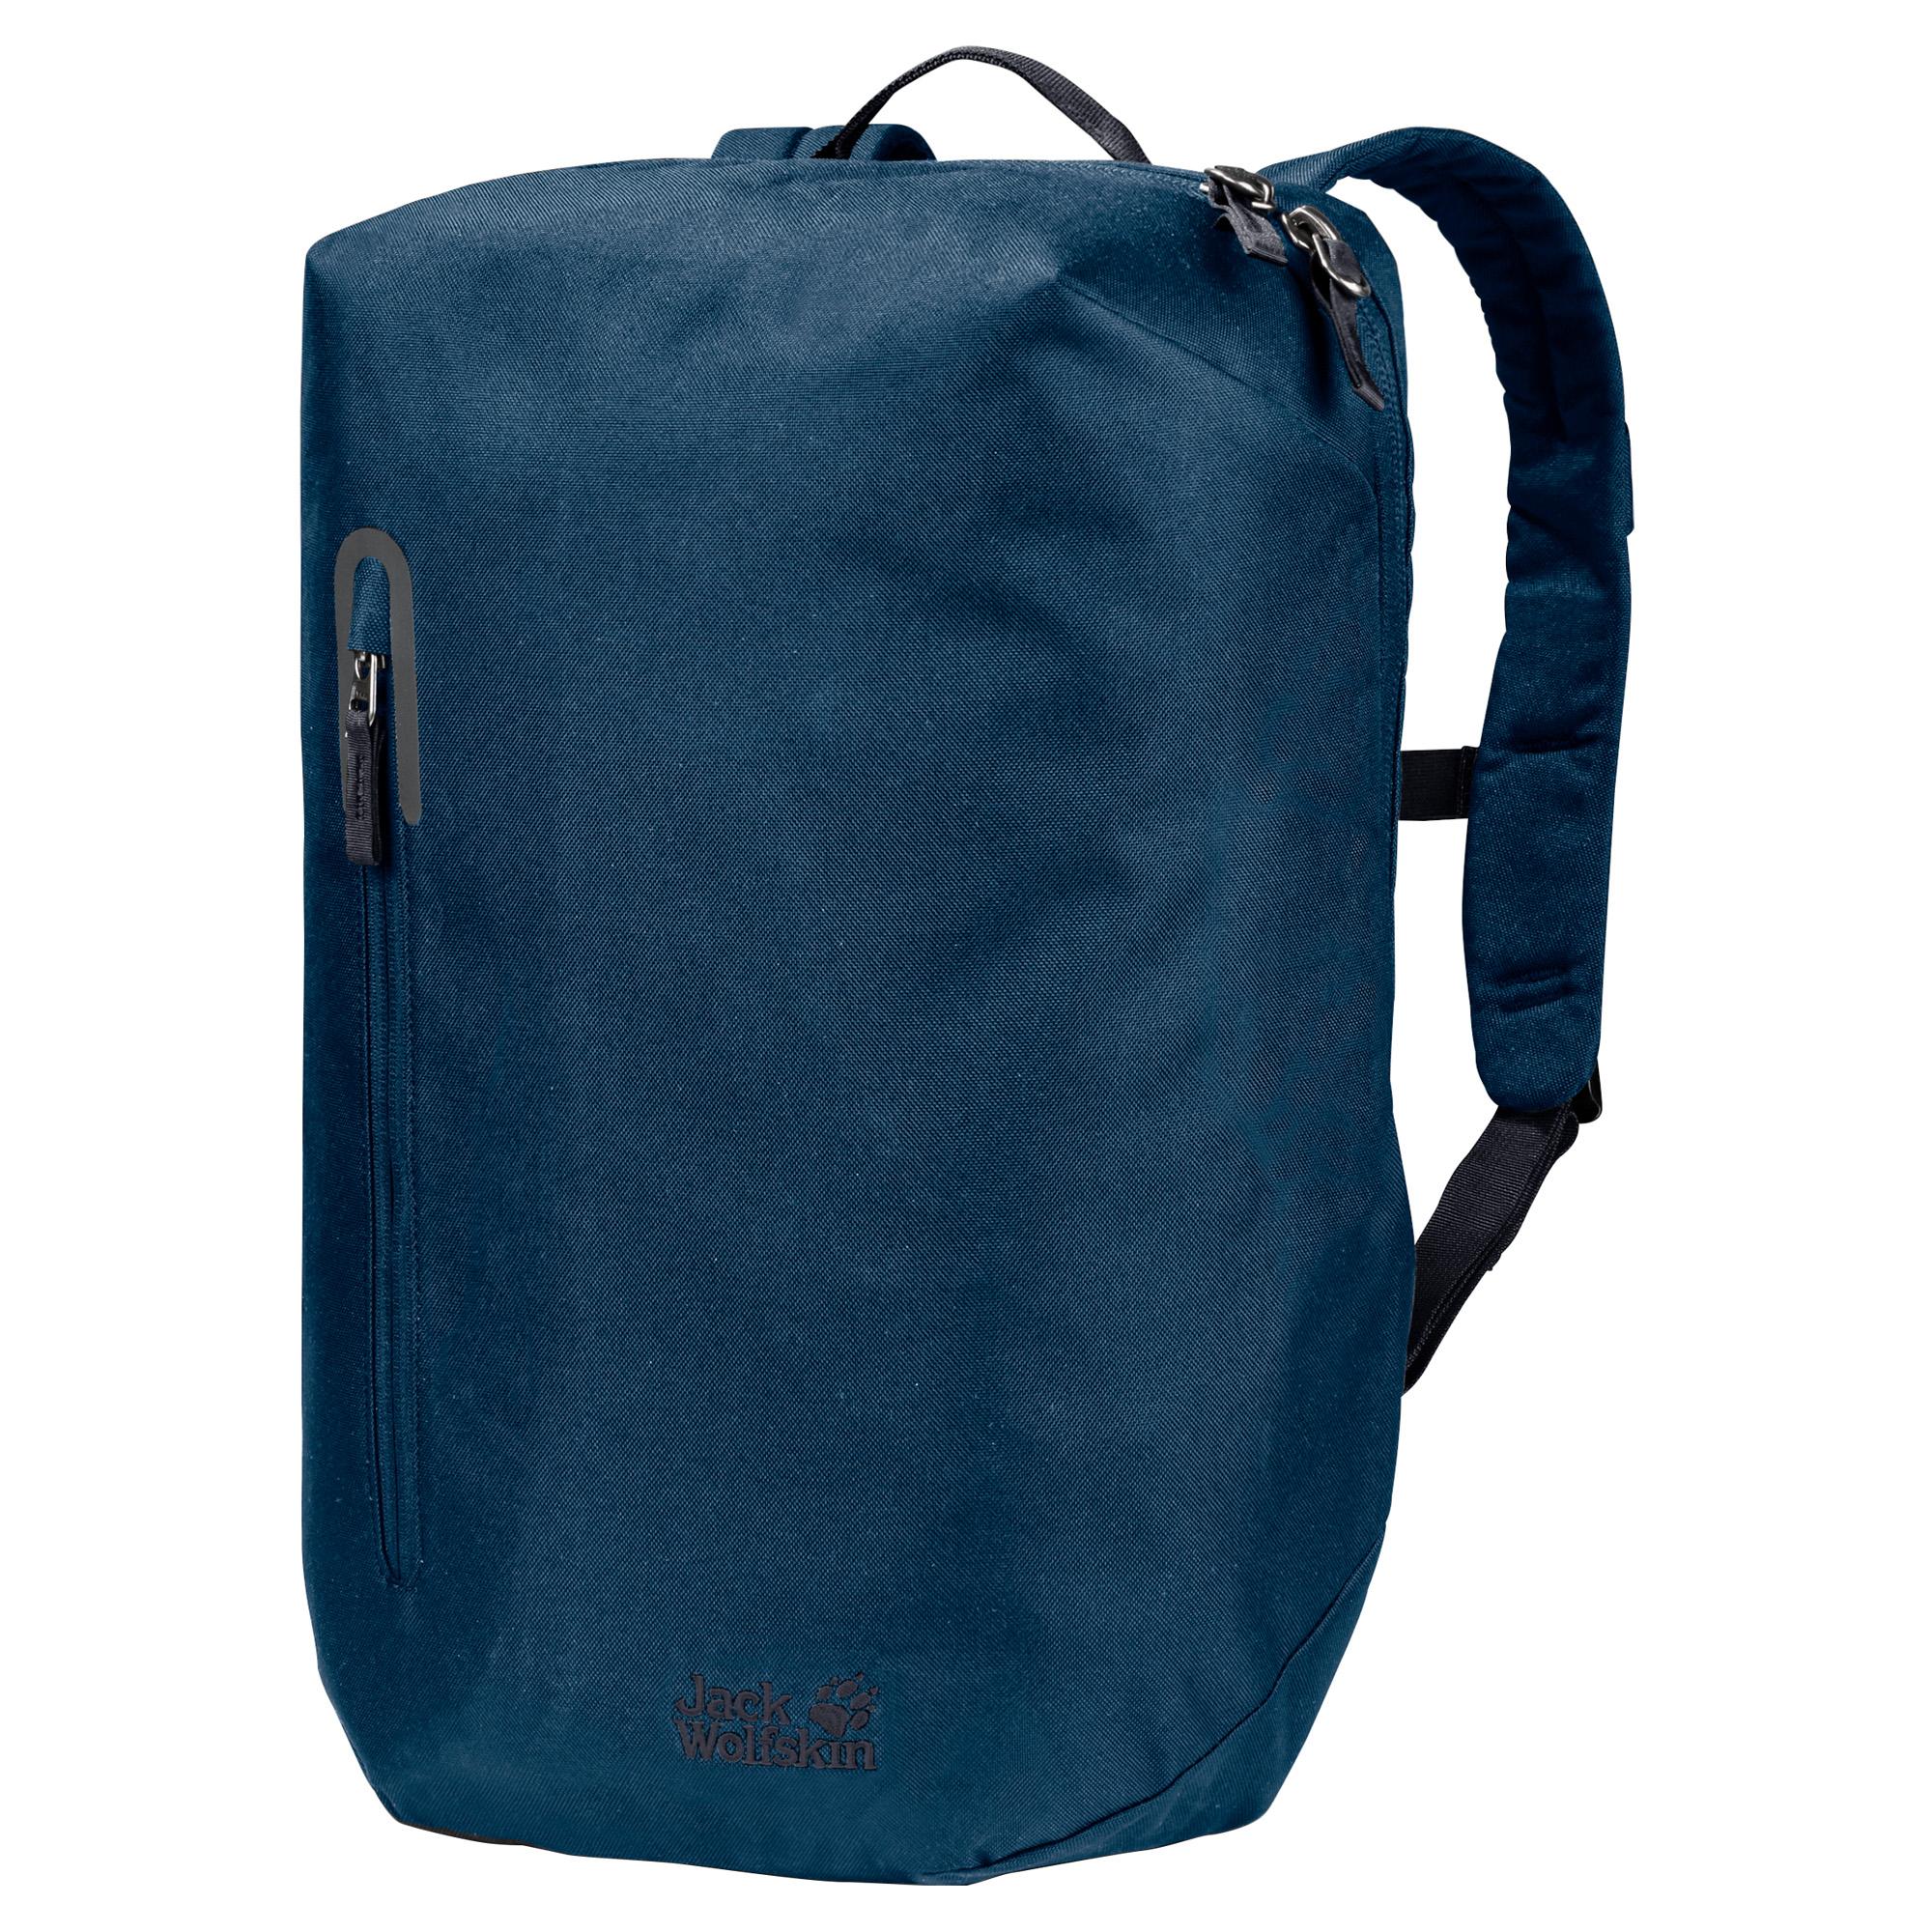 Jack Wolfskin Bondi Rucksack (Farbe: 1134 poseidon blue)